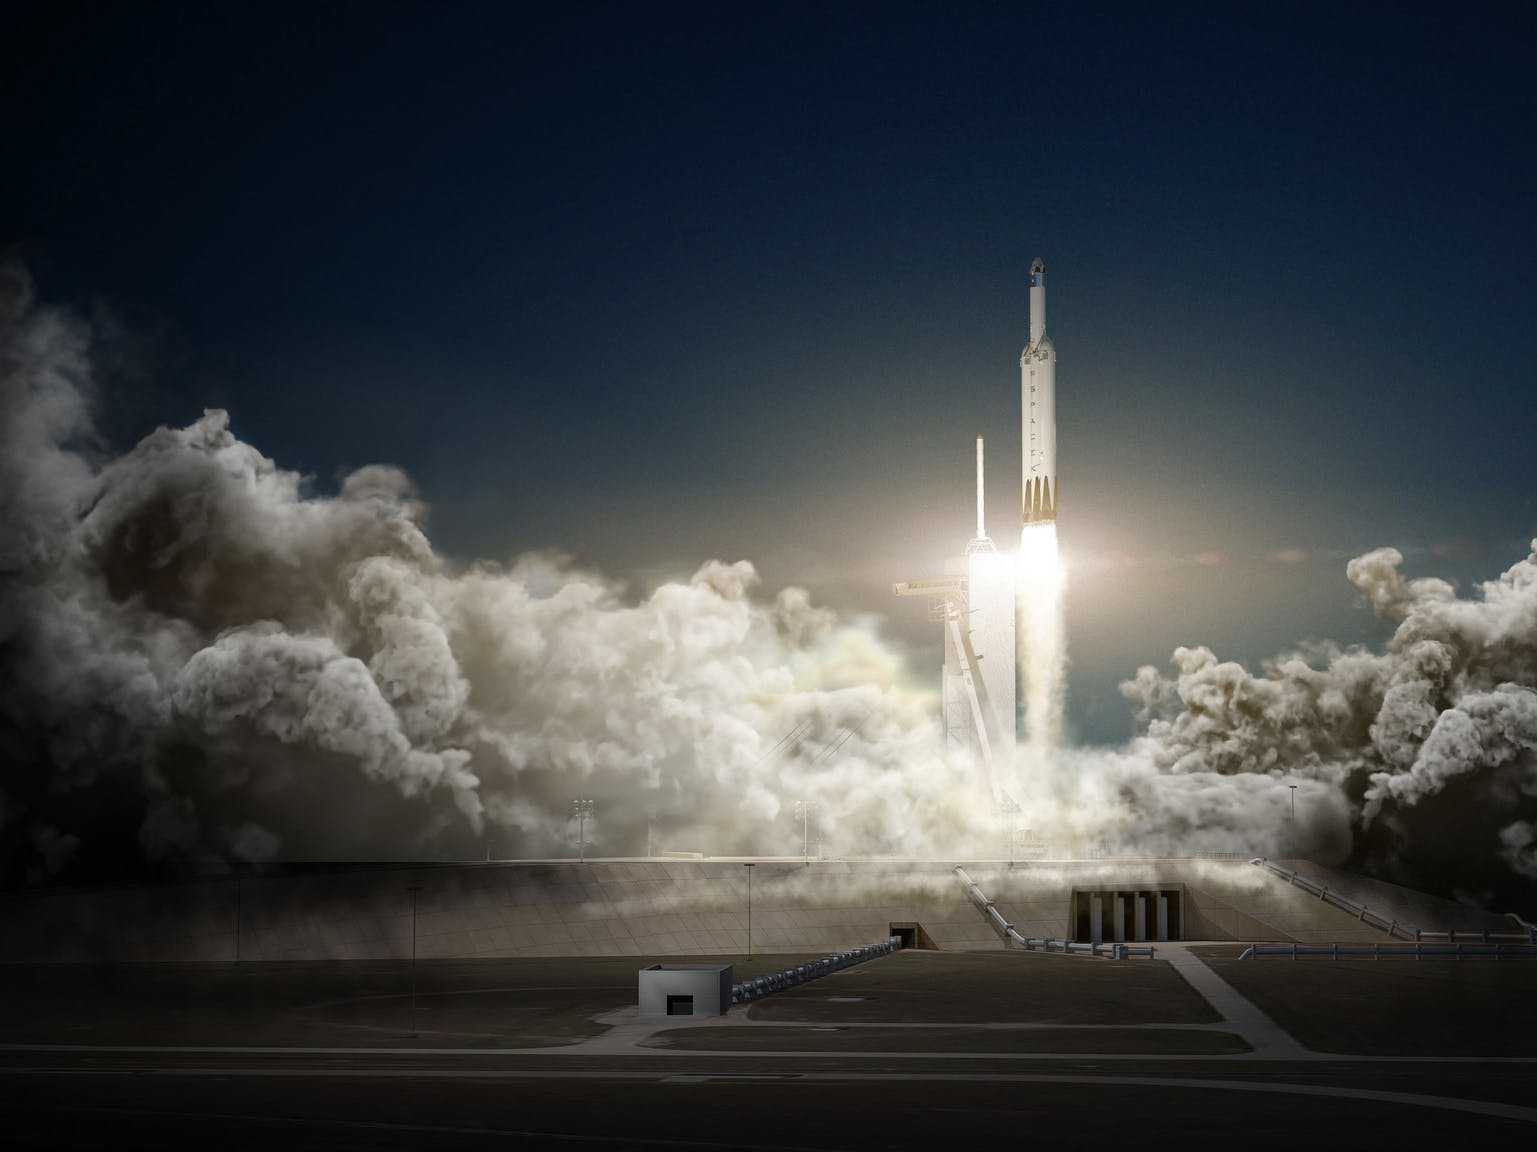 Elon Musk's Big Falcon Rocket Just Got a New Name: Starship